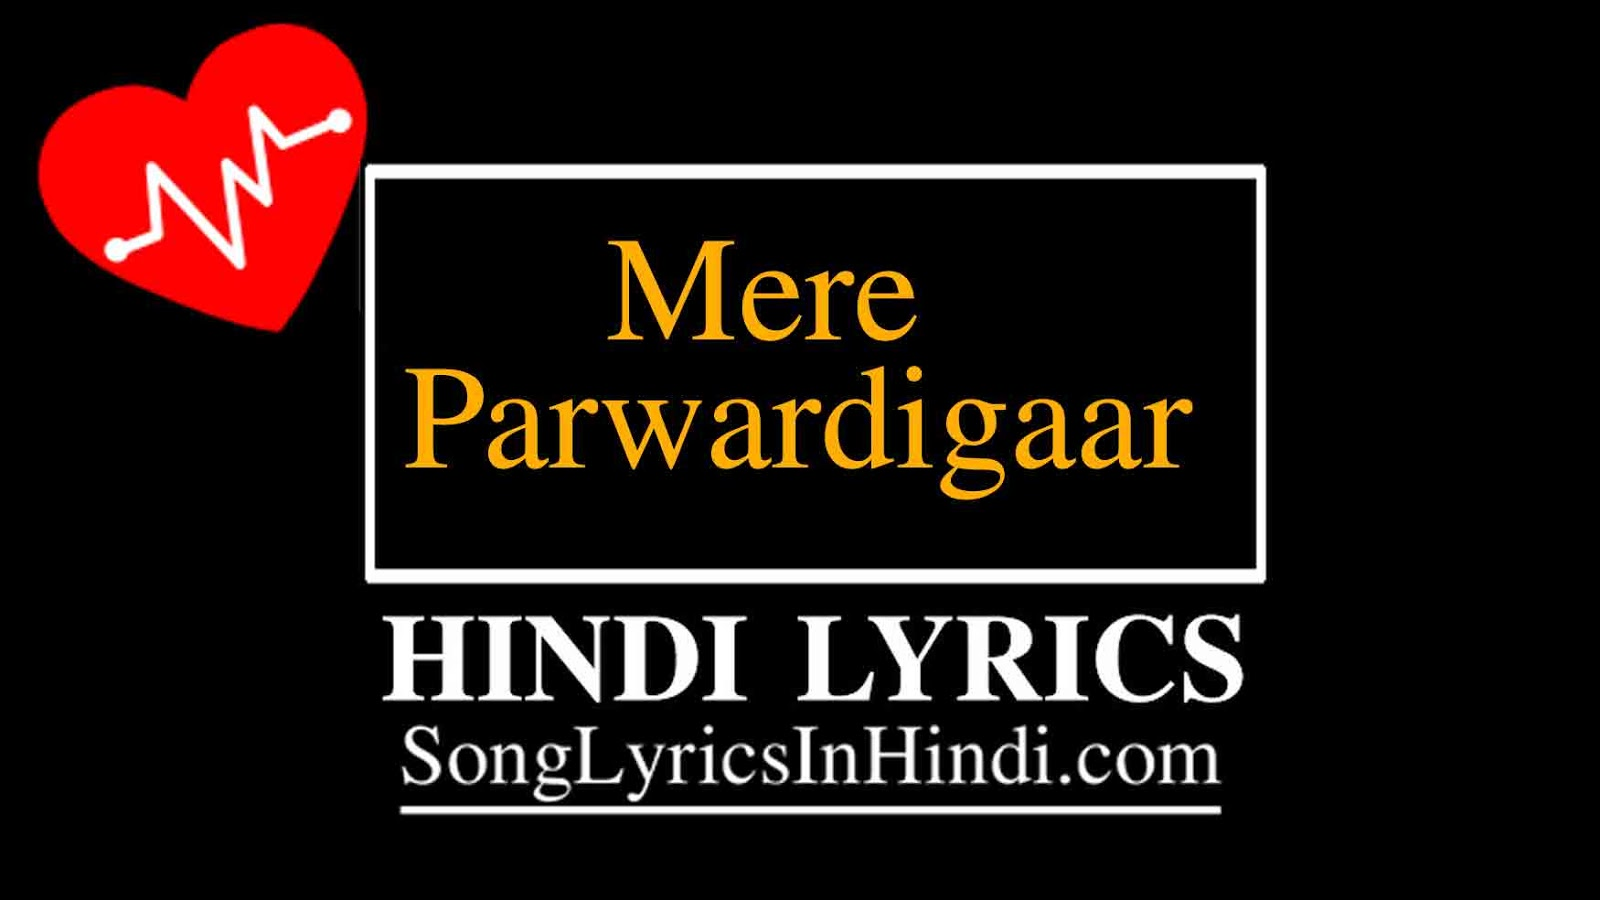 Mere Parwardigaar Hindi Lyrics:-Scotland | Arijit Singh | Harpreet Singh | Rajiv Rana